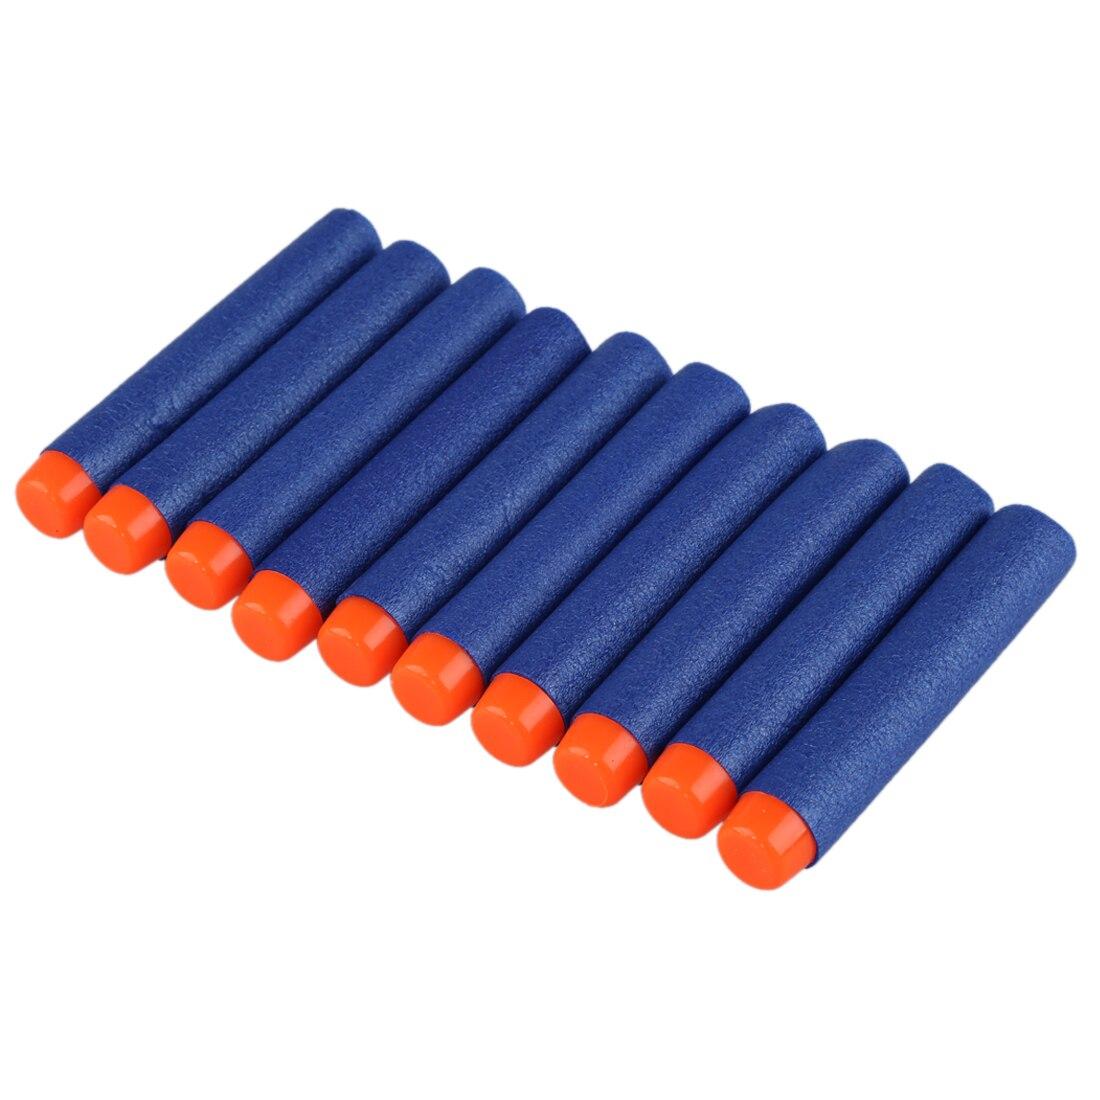 New 100pcs 7 2cm Refill Darts font b Toy b font Gun Bullets for Nerf Series